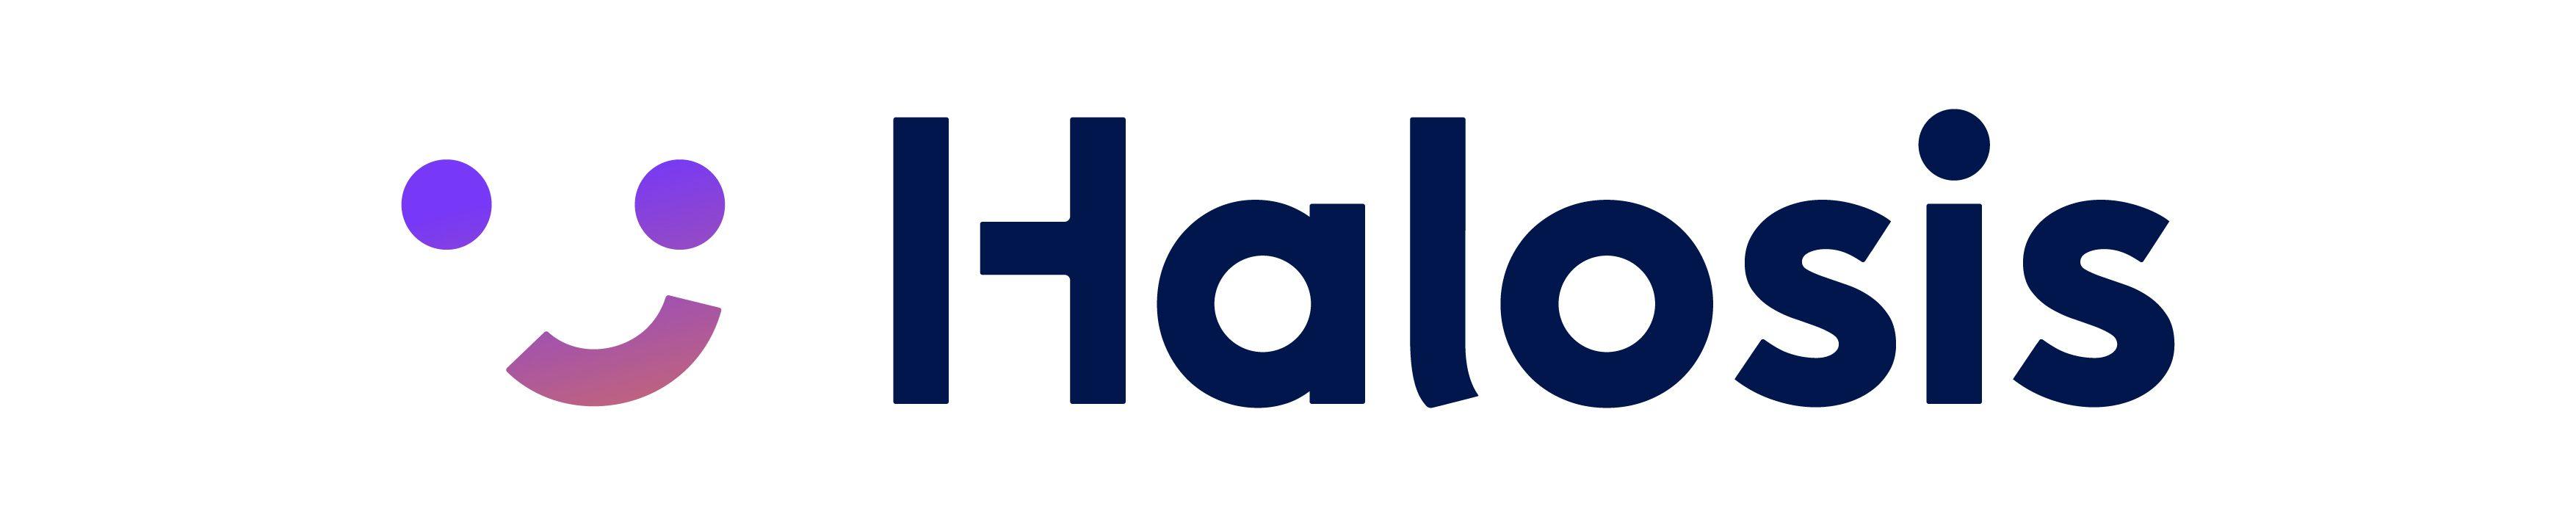 HaloSis Blog